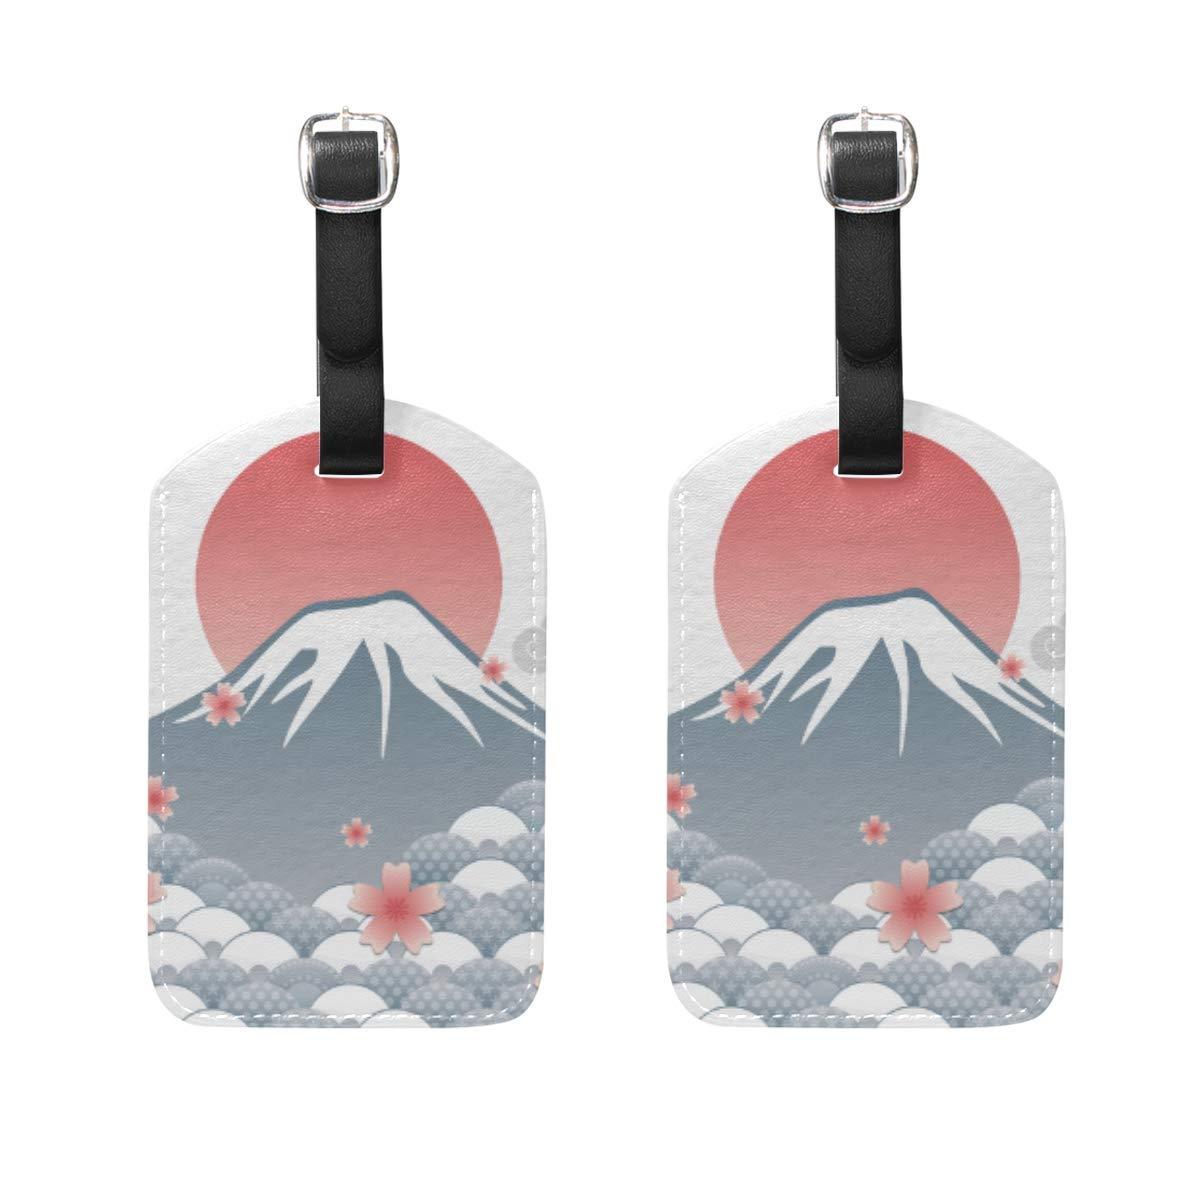 Koperororo Modern Minimalist Style Q Version Cartoon Animal Bird Travel Labels Luggage Tag Funny Pattern Name Card Holder for Baggage Set Of 2